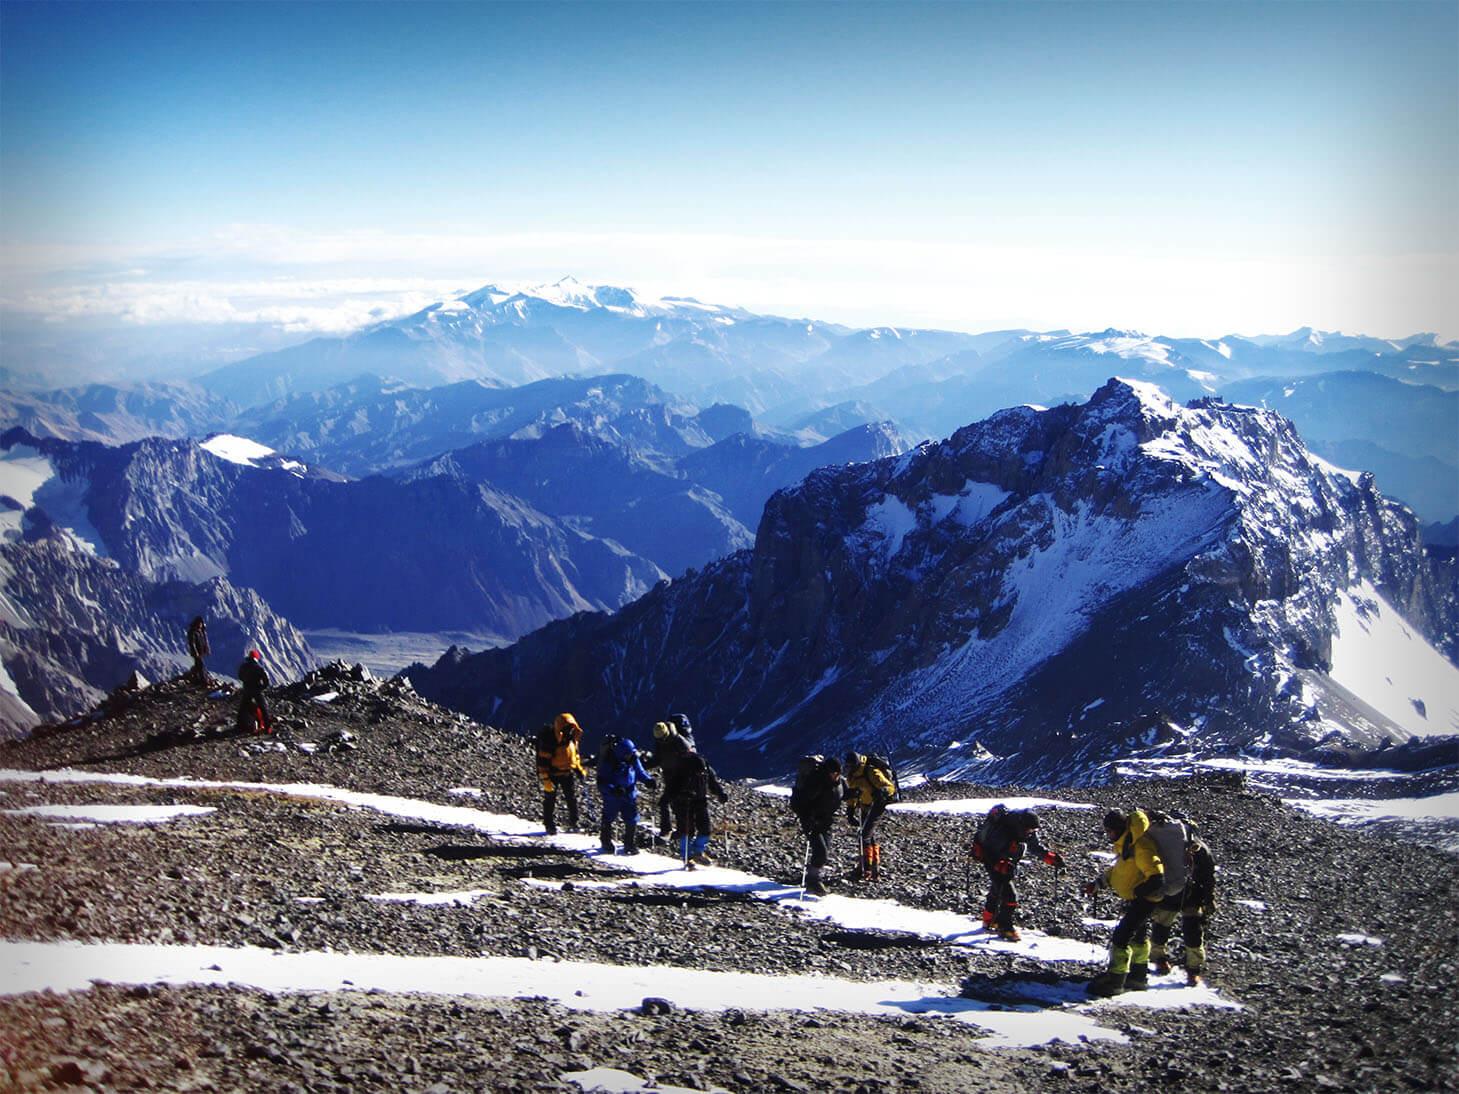 16-trekking-to-summit11